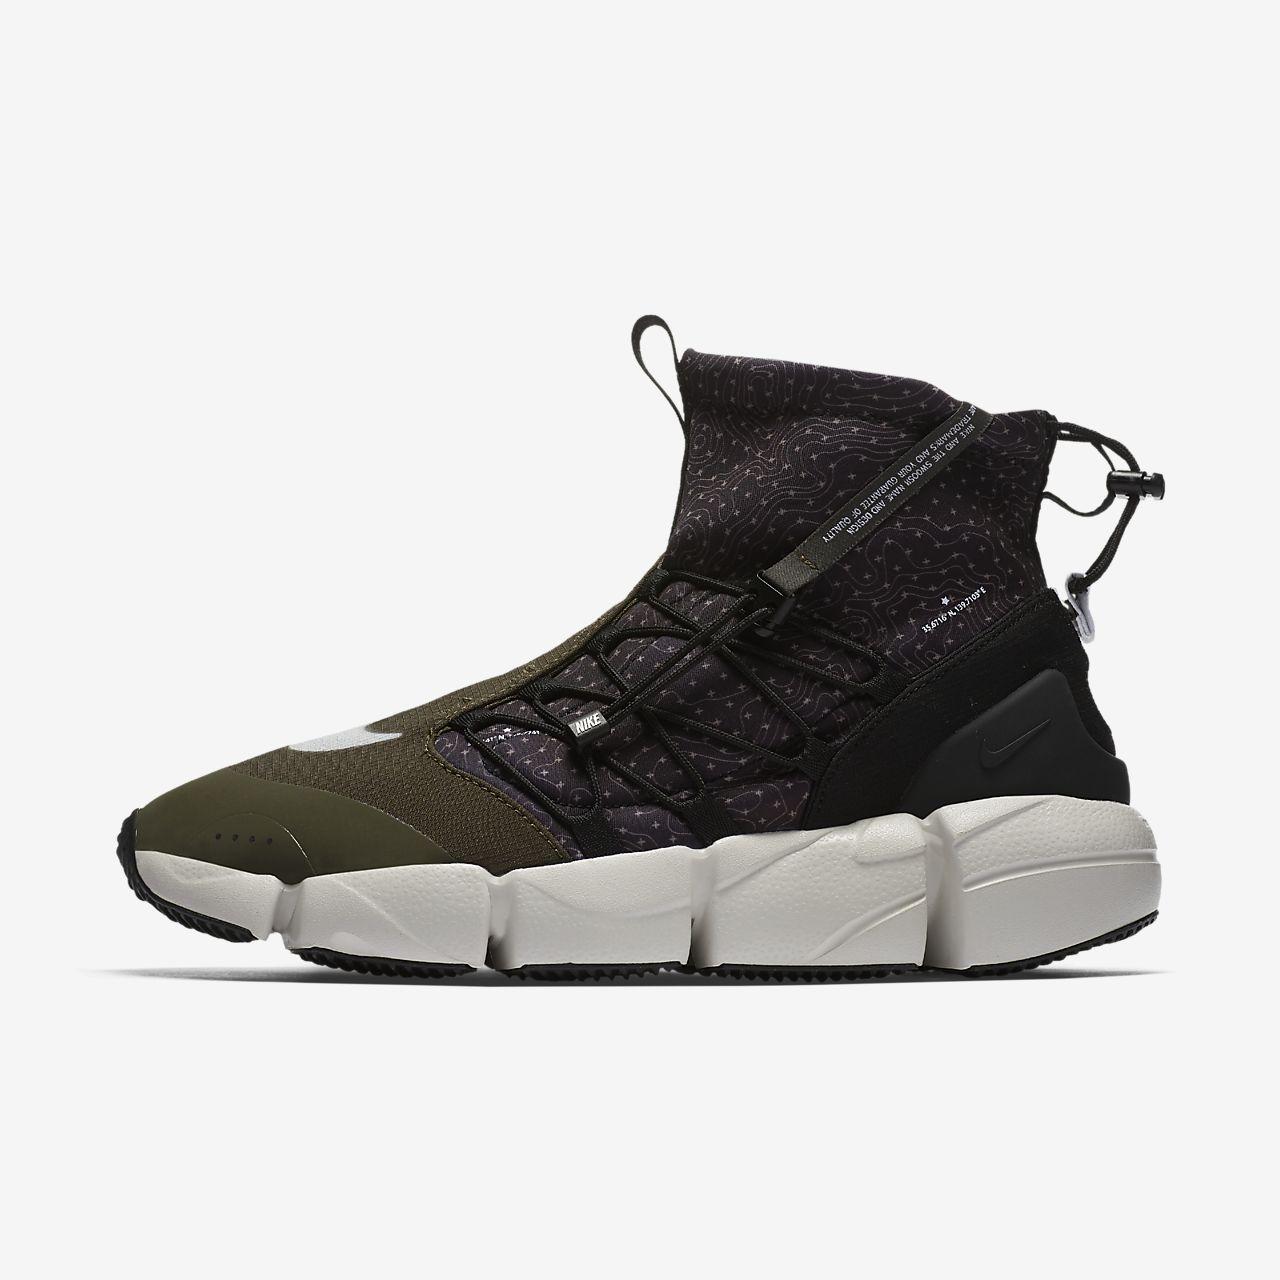 size 40 d9f20 dc1da Calzado para hombre Nike Air Footscape Mid Utility